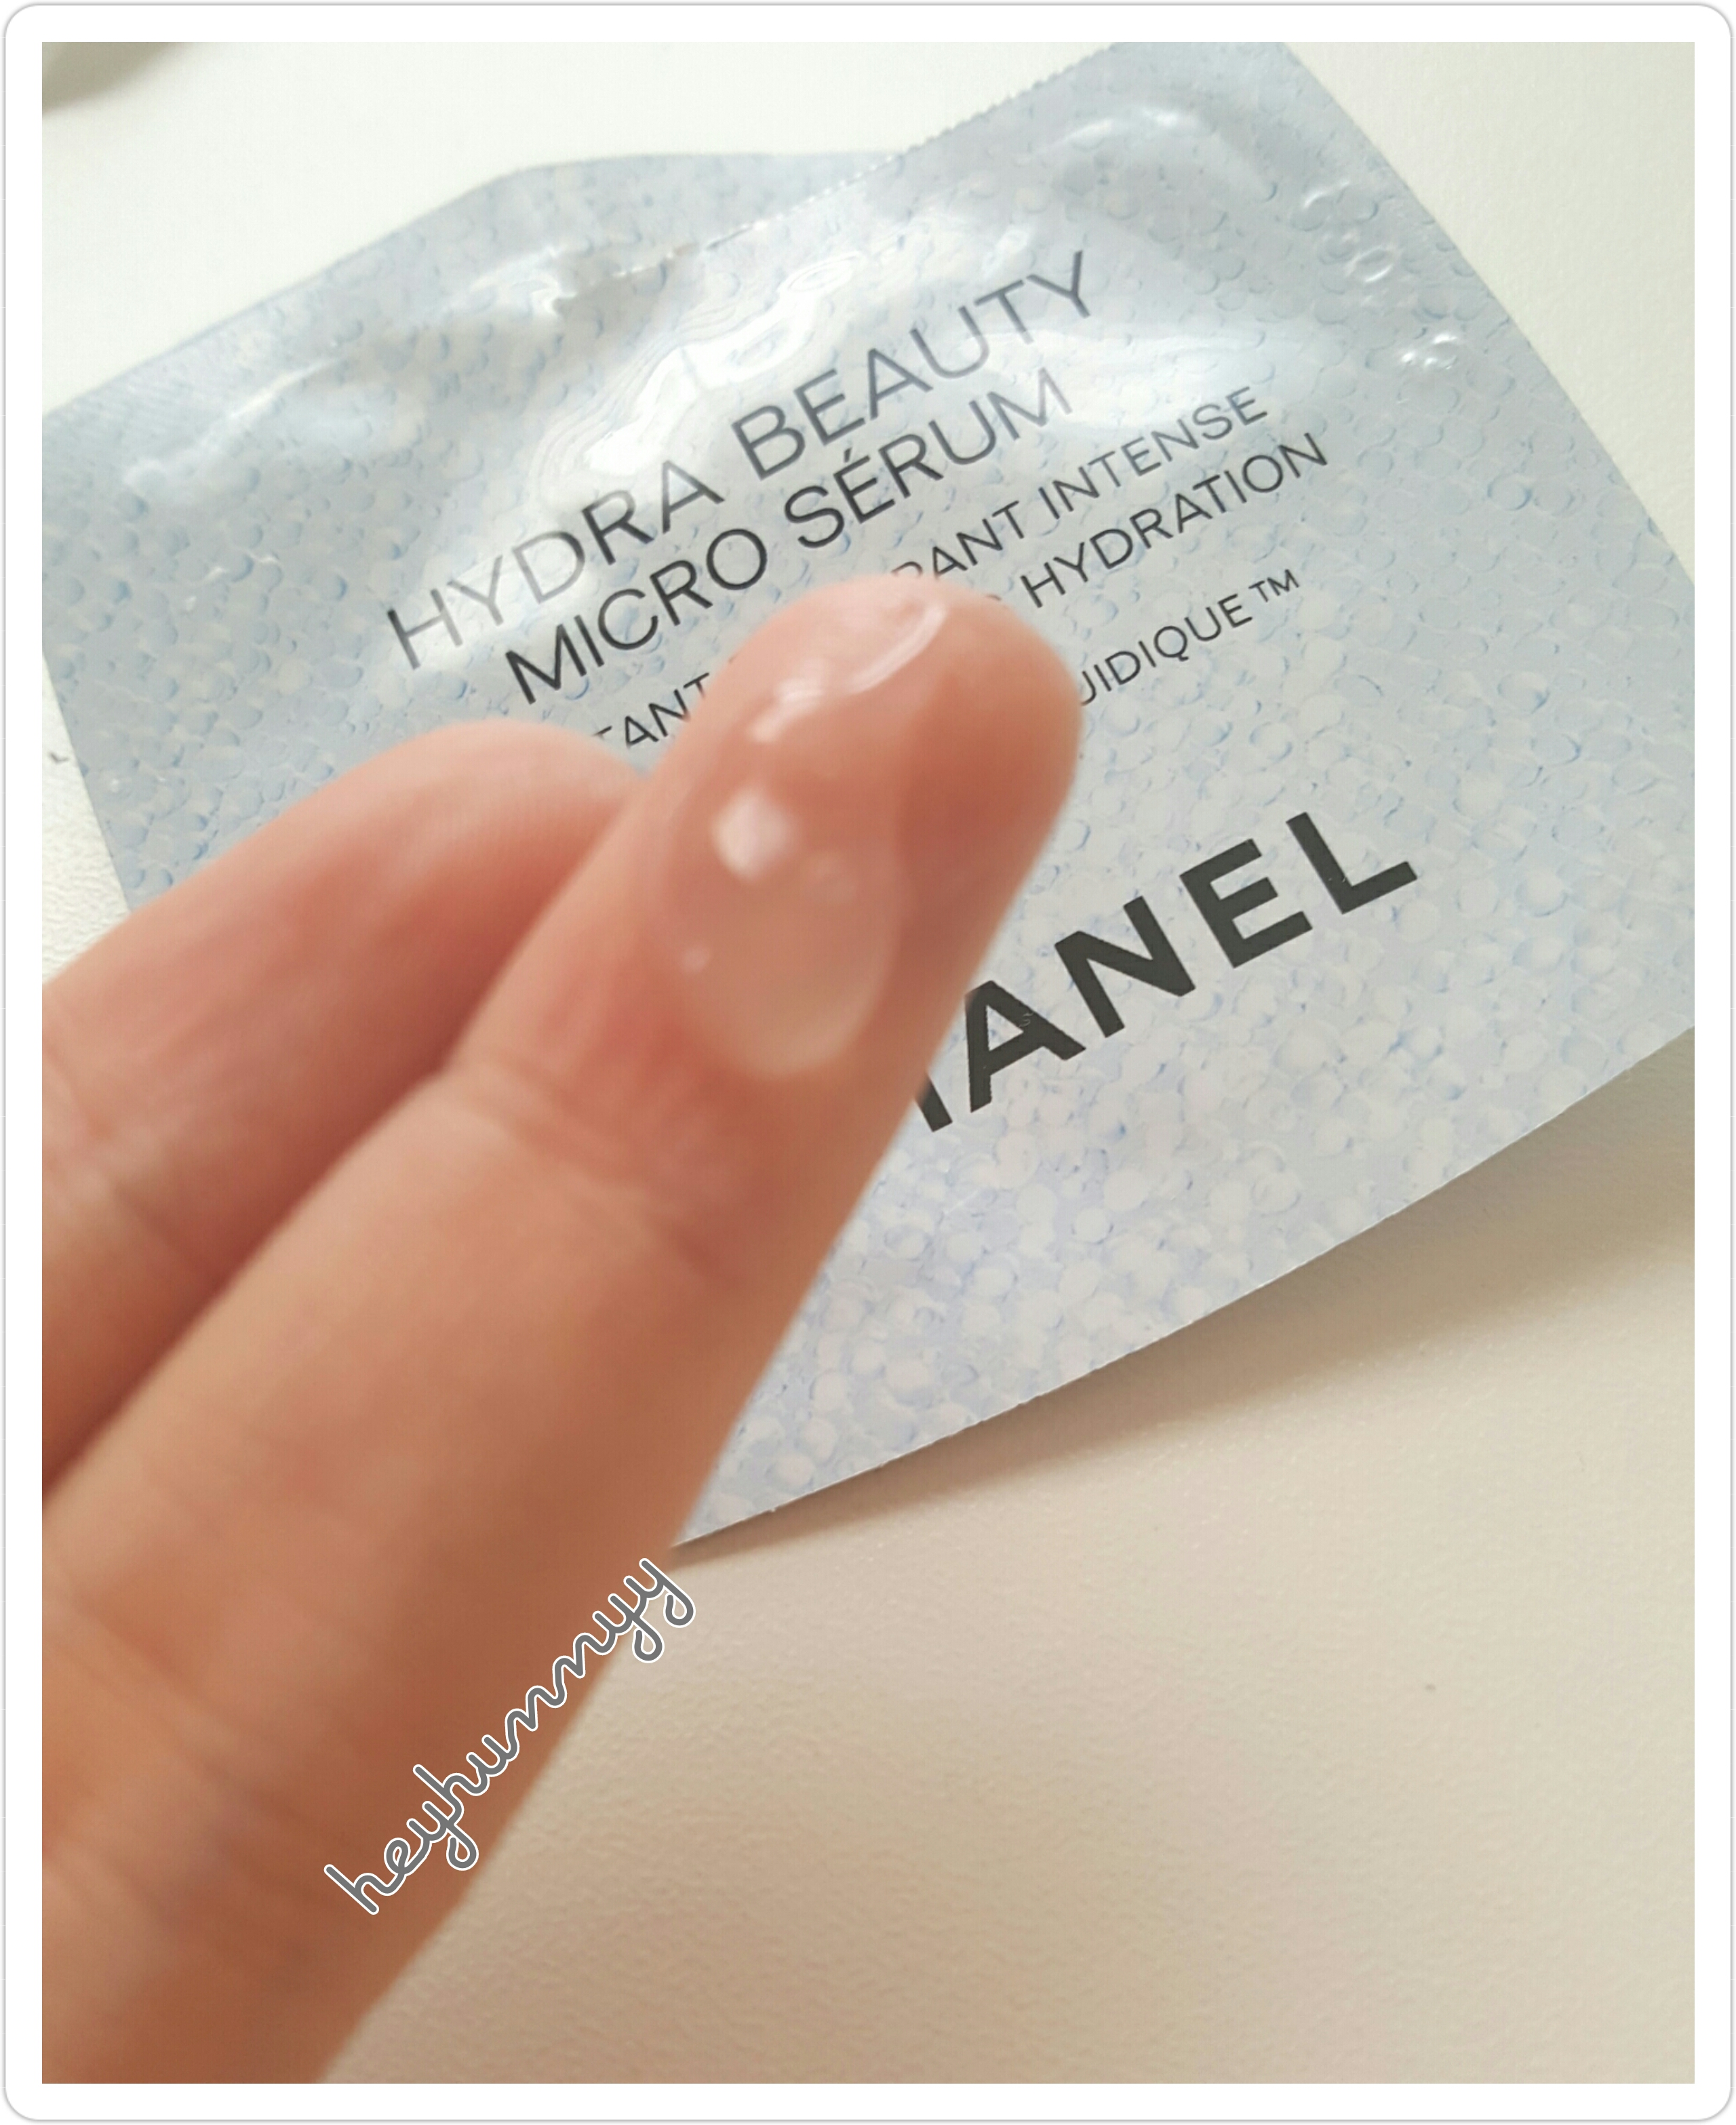 ::REVIEW:: Chanel - Hydra Beauty Micro Serum! hunnyy